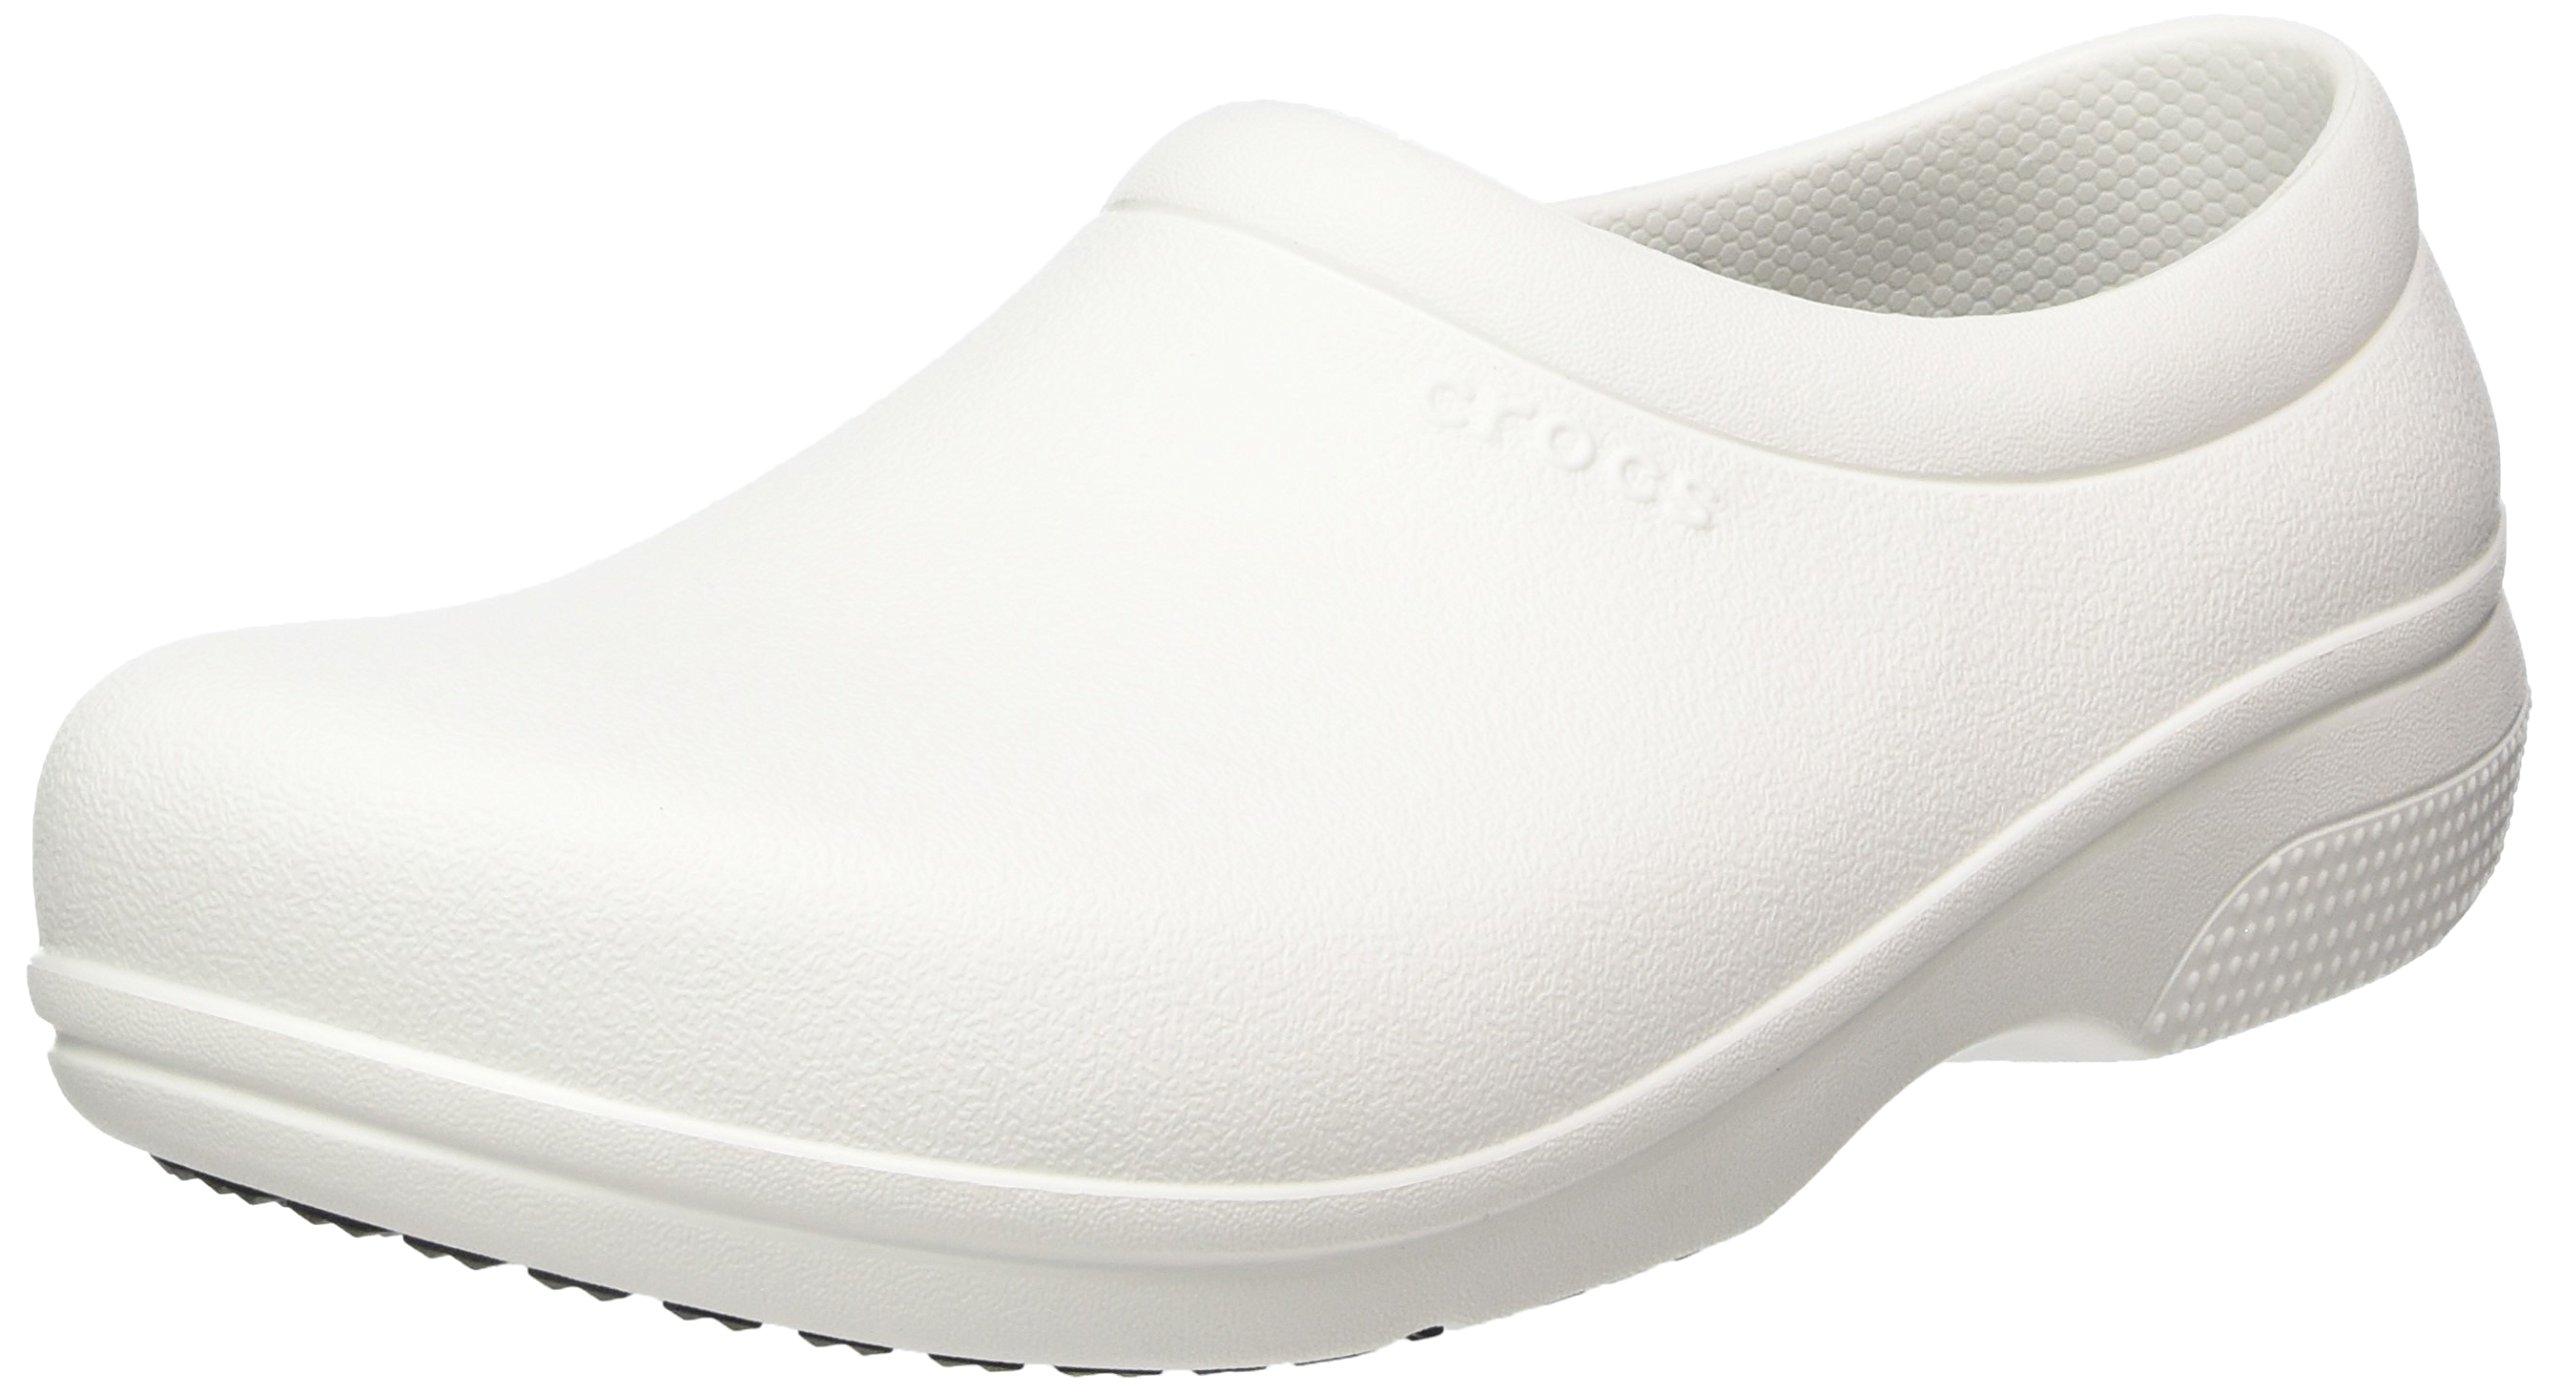 Crocs On The Clock Work Slipon Medical Professional Shoe, White, 13 US Men/ 15 US Women M US by Crocs